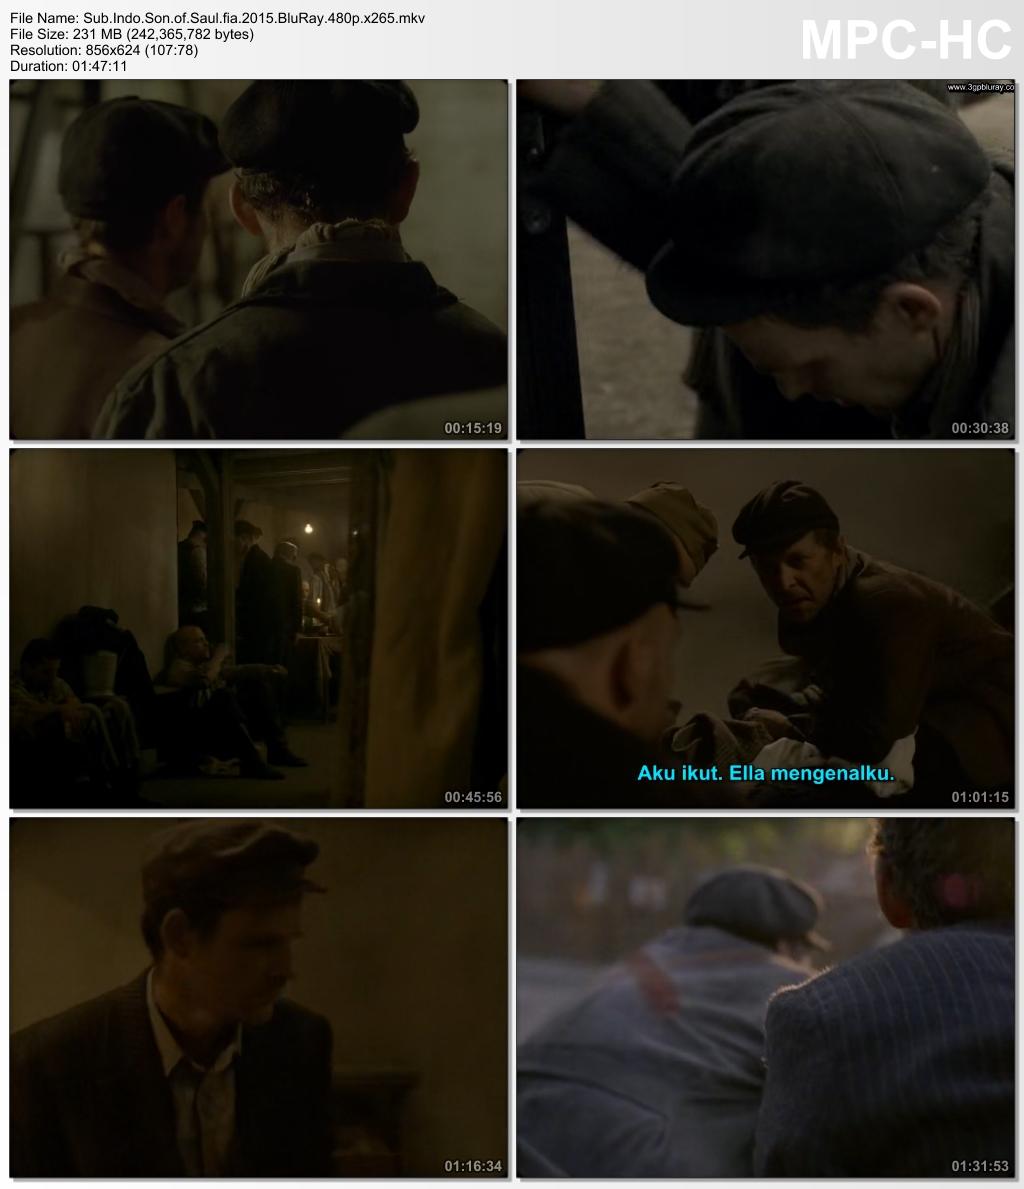 Screenshots Download Film Gratis Son of Saul (2015) BluRay 480p MP4 Subtitle Indonesia 3GP Nonton Film Gratis Free Full Movie Streaming